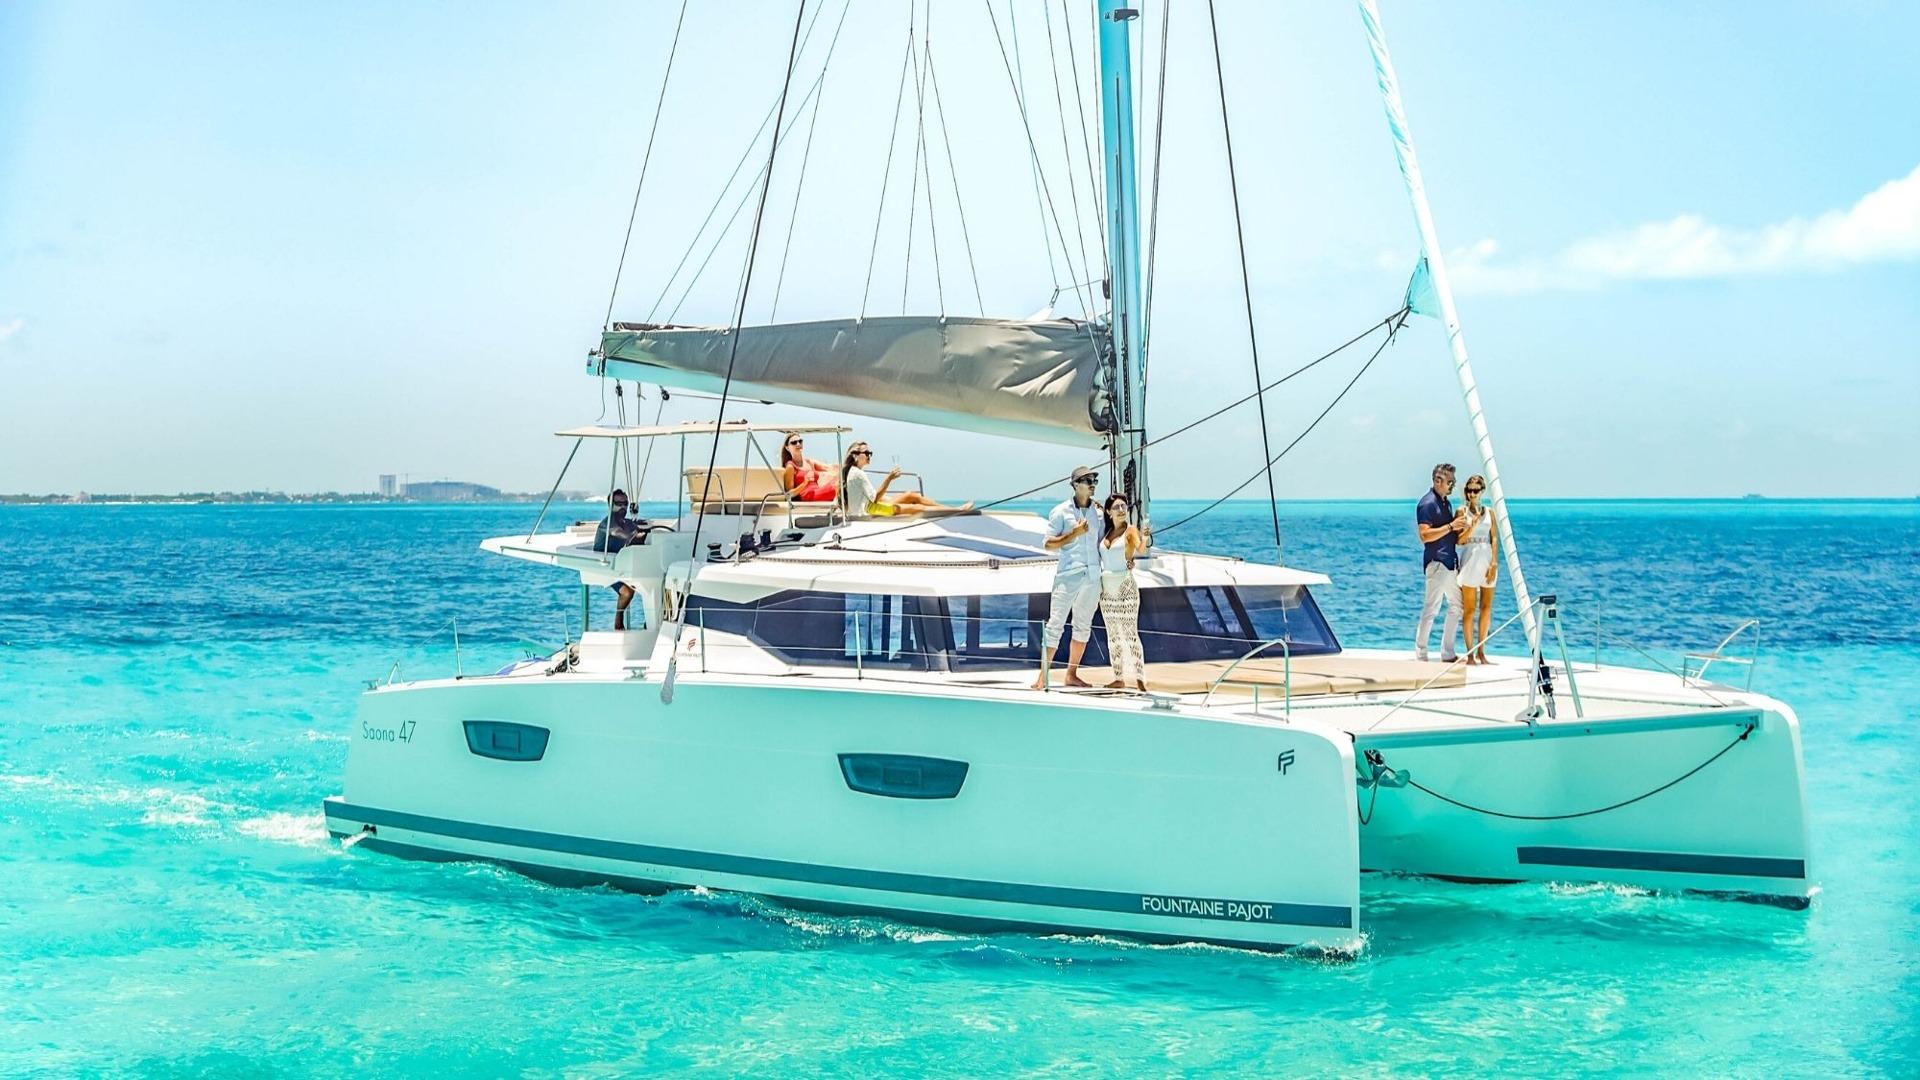 7 - LowRes - Private Isla Mujeres tour in catamaran - Victoria - Cancun Sailing